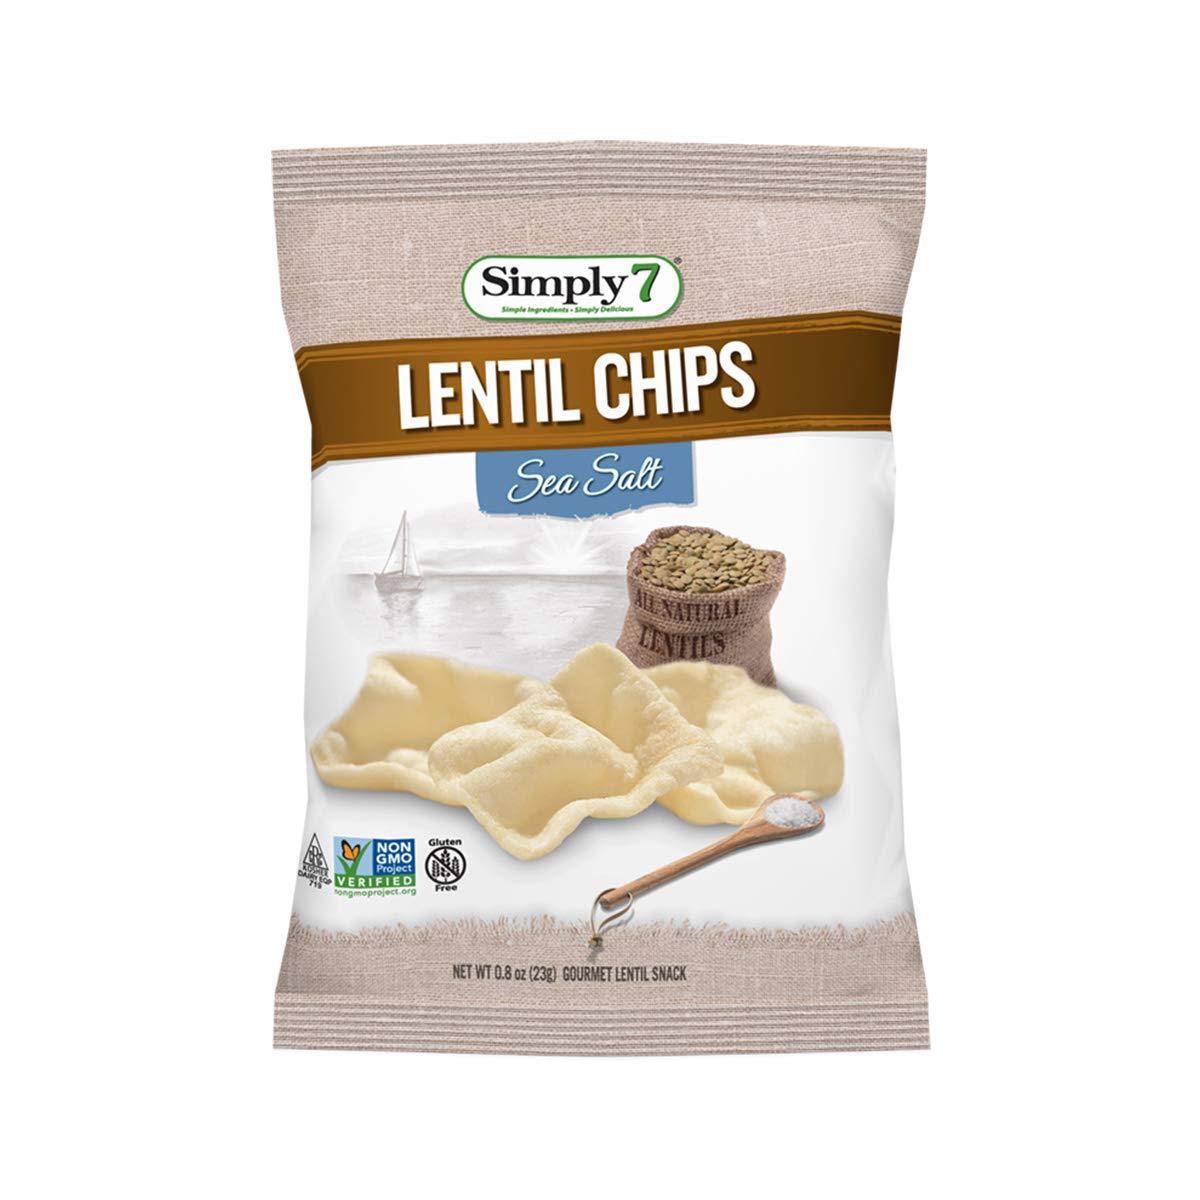 Simply 7 Lentil Chips, Sea Salt, 0.8 Ounce (Pack of 24)